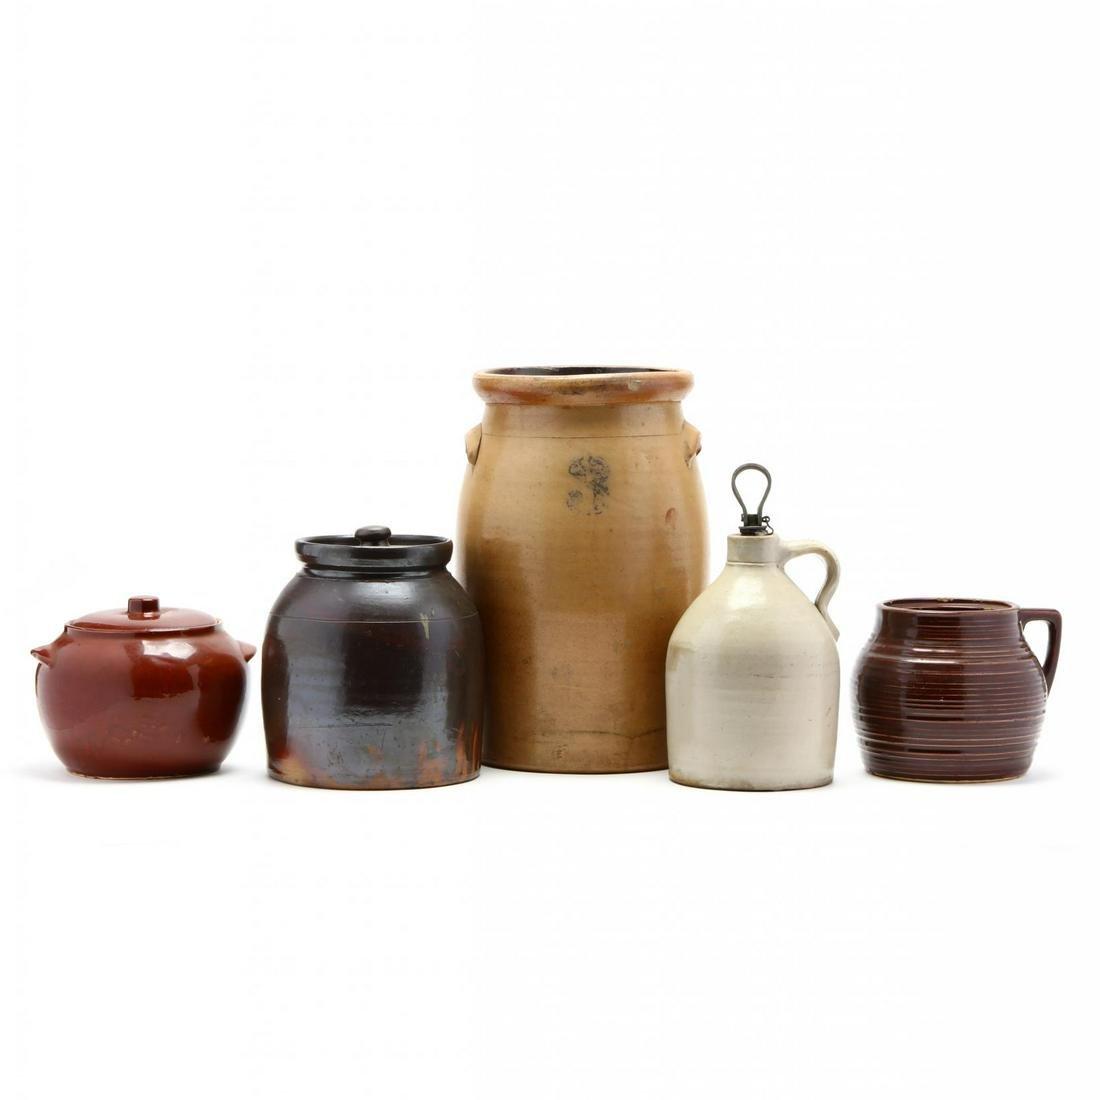 Five Pieces of Antique Stoneware